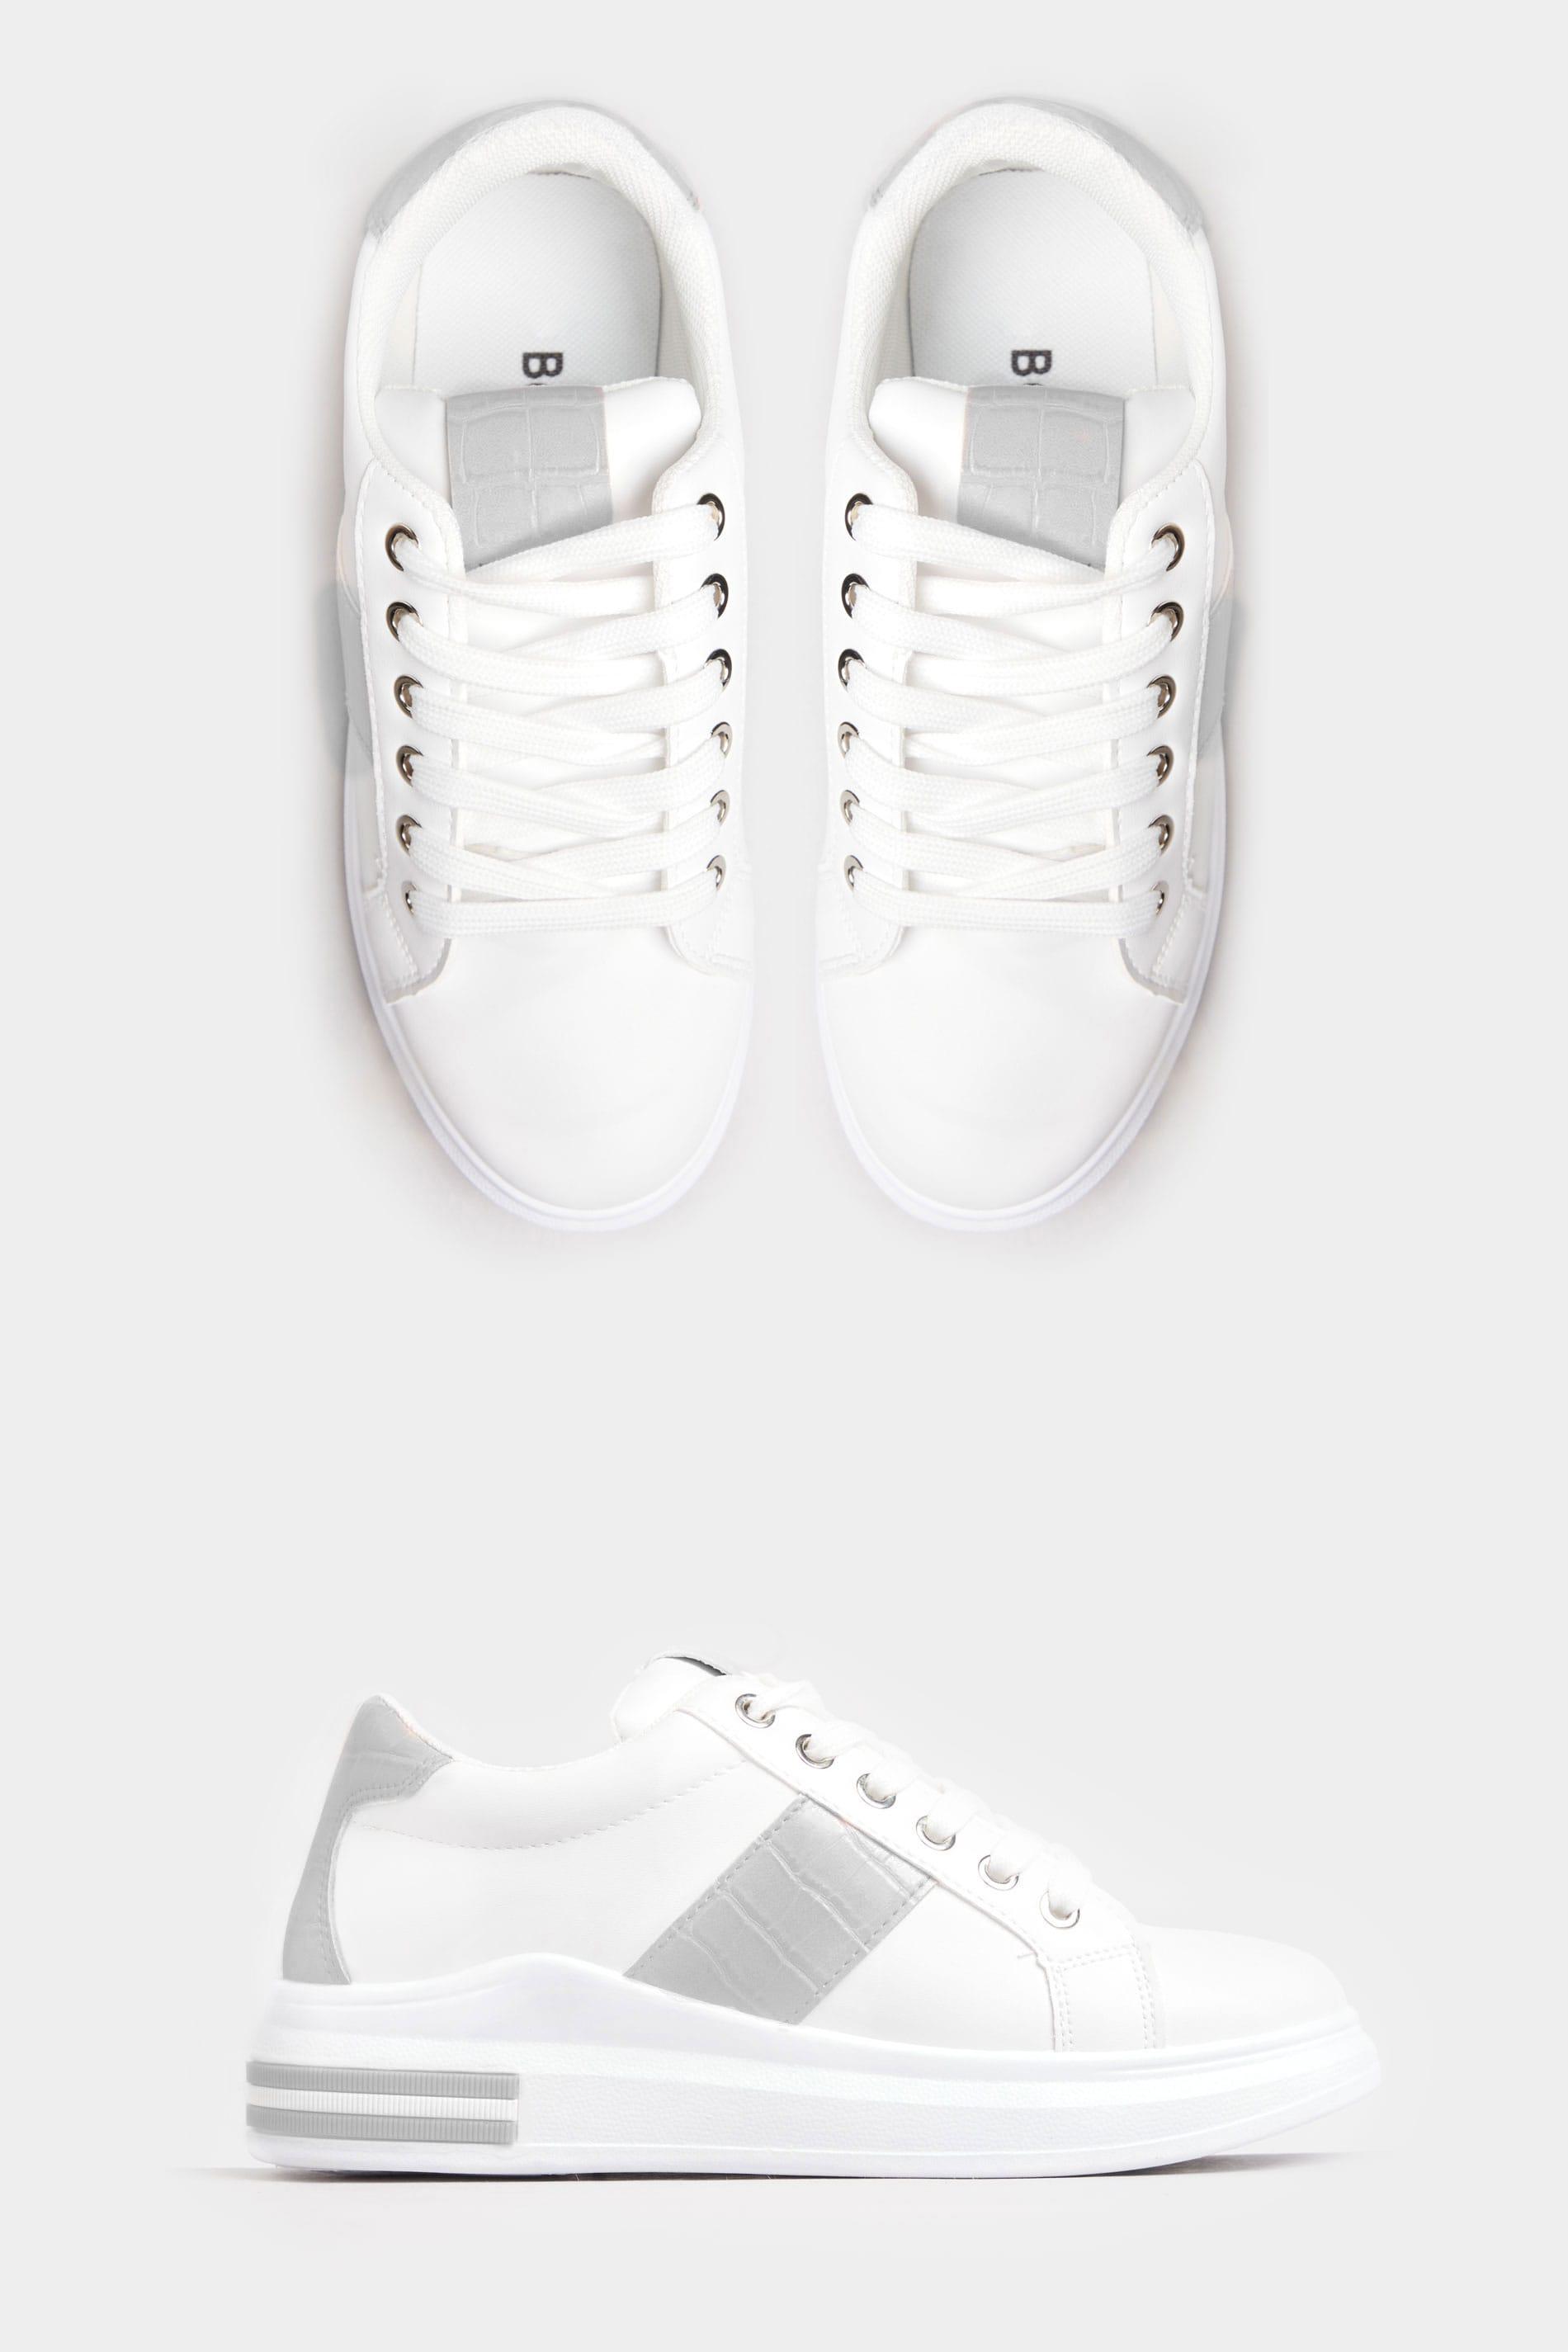 LIMITED COLLECTION Białe buty sportowe, grey croc effect